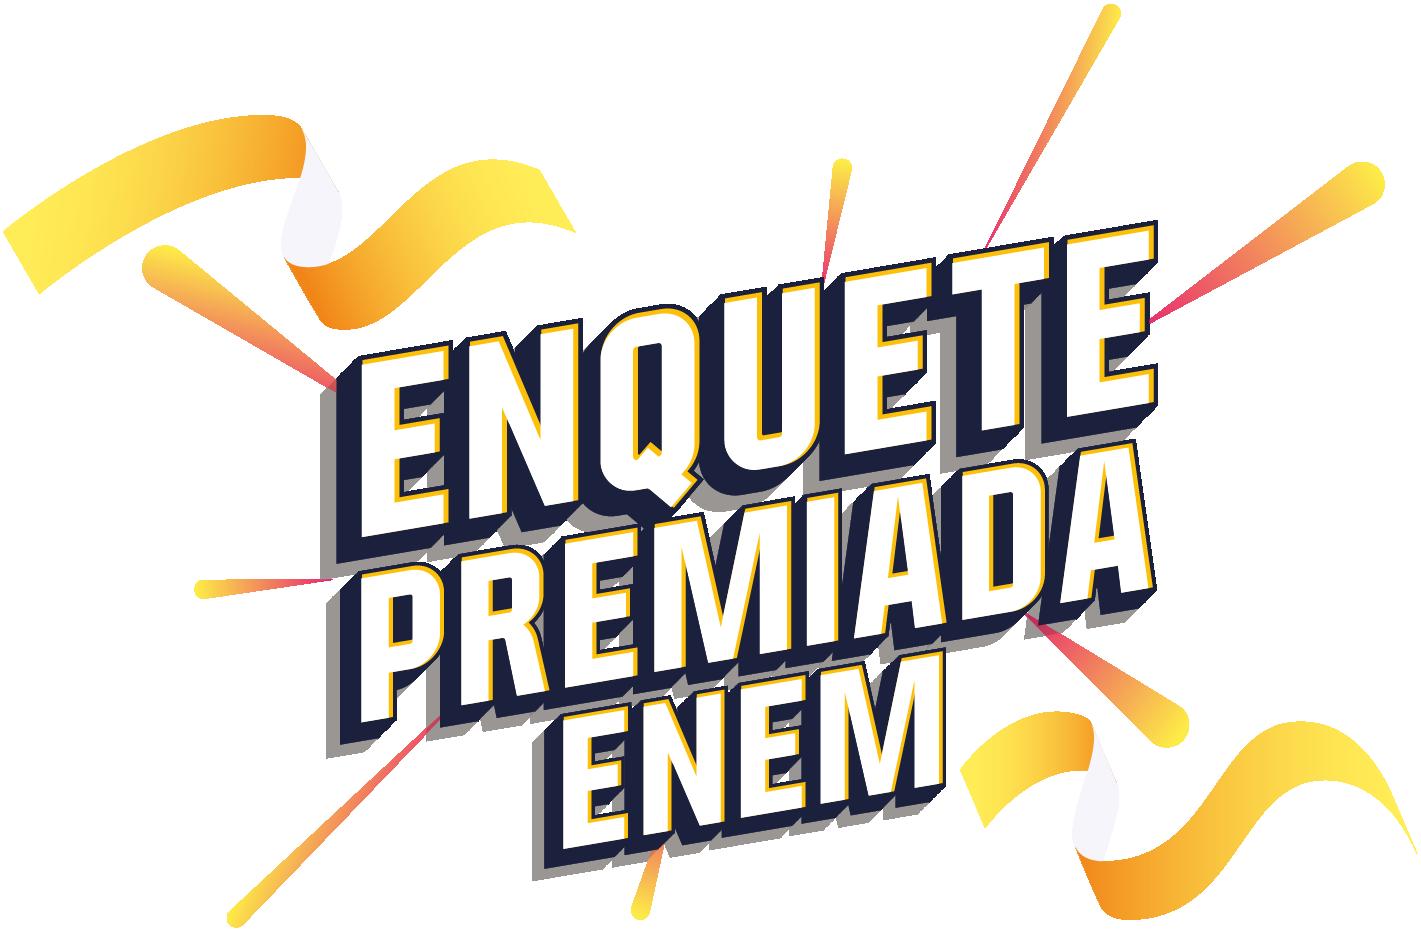 Enquete Premiada Enem